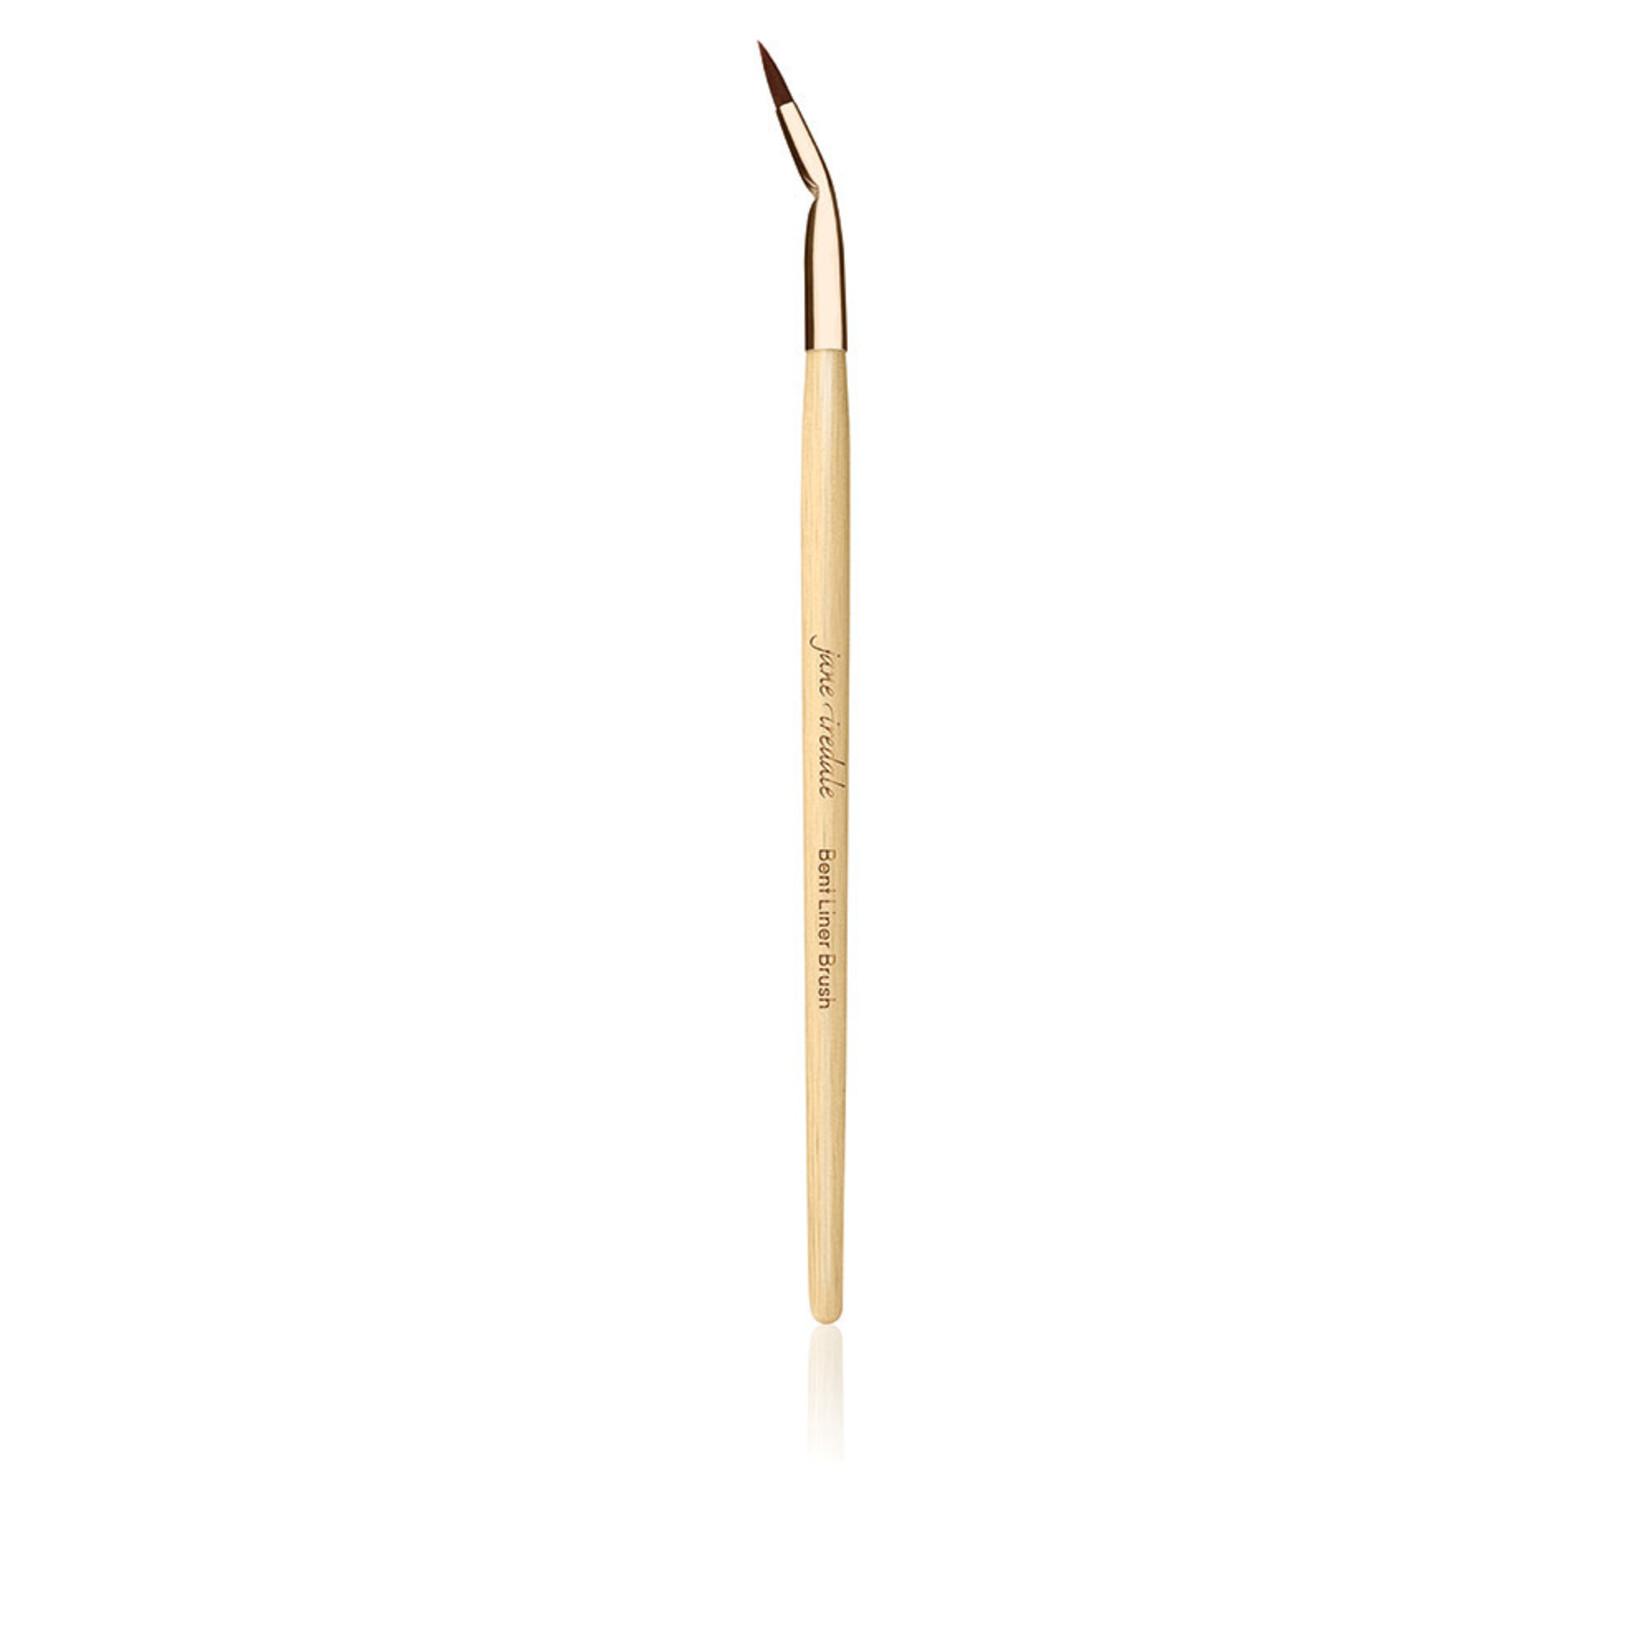 jane iredale Bent liner brush